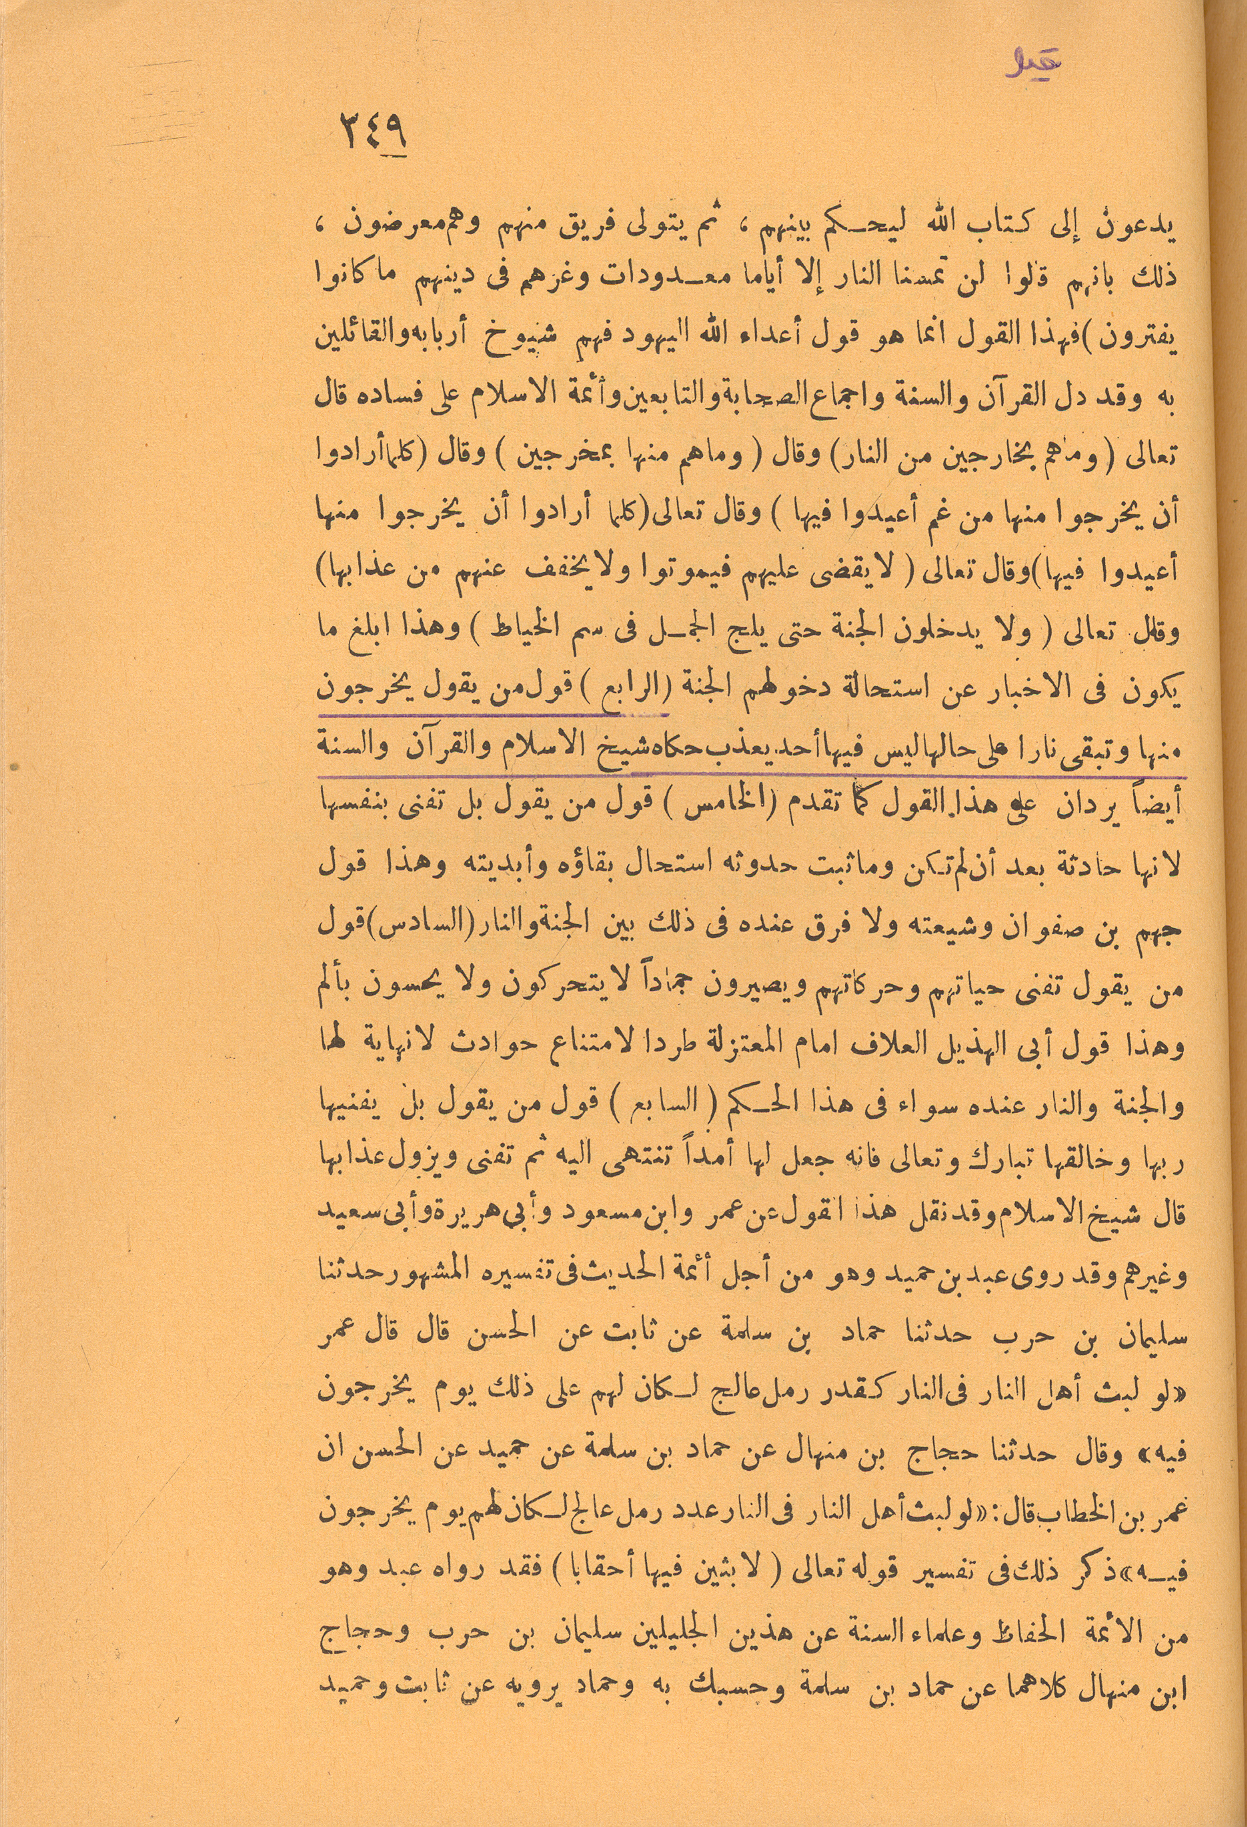 Page ou Ibn Qayyim rapporte la parole de Ibn Taymiyya sur l enfer